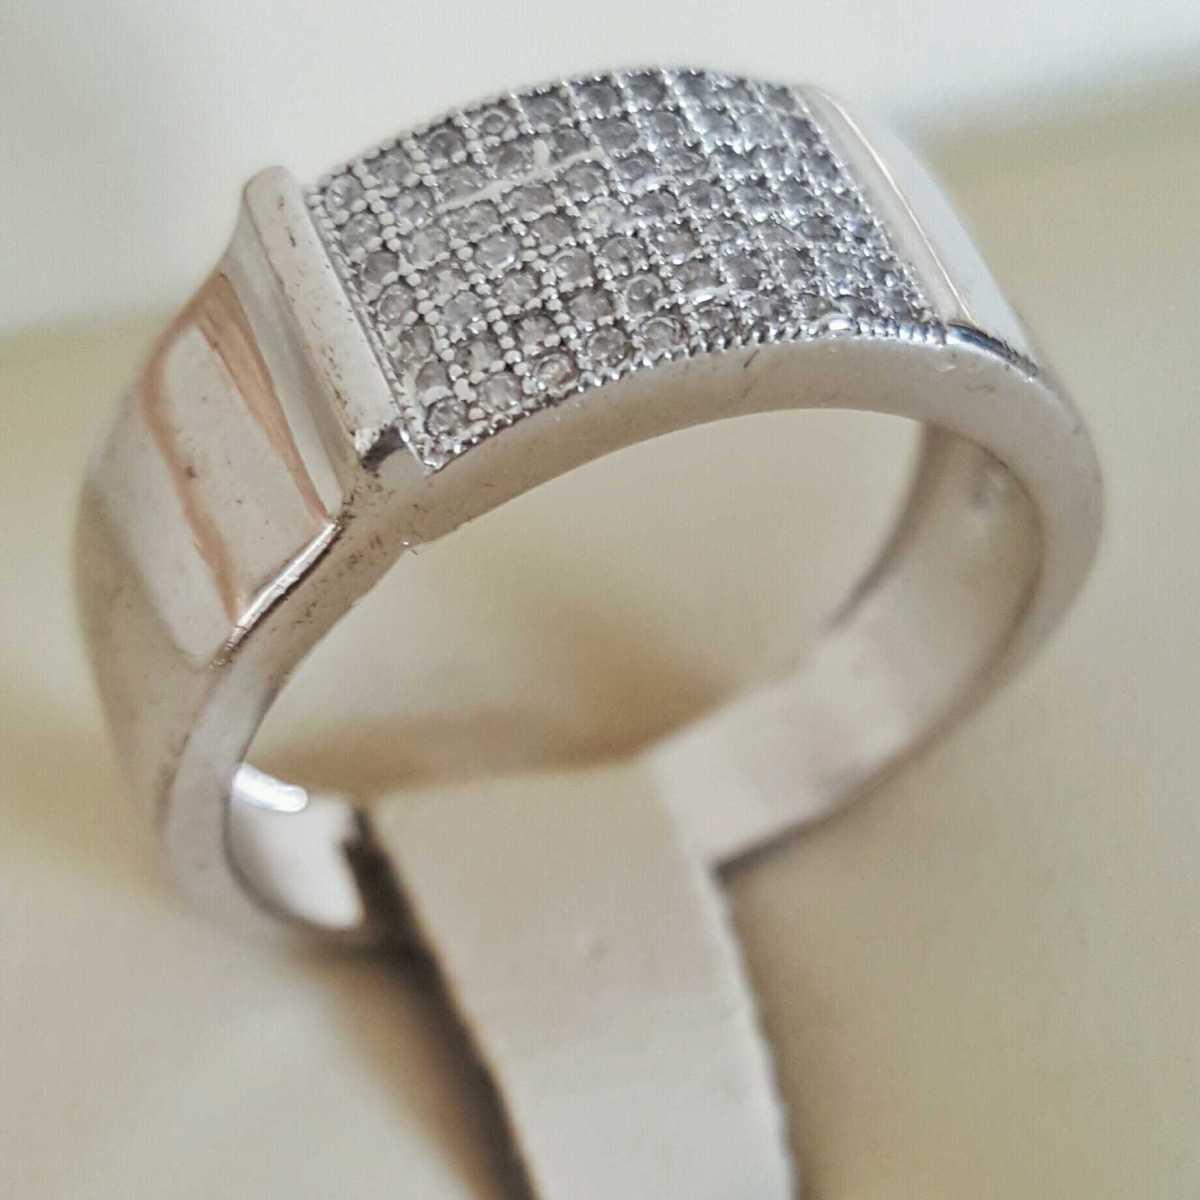 Real Silver 925 Jewellery Buy in Pakistan 73 natural gemstones pakistan + 925 silver jewelry online